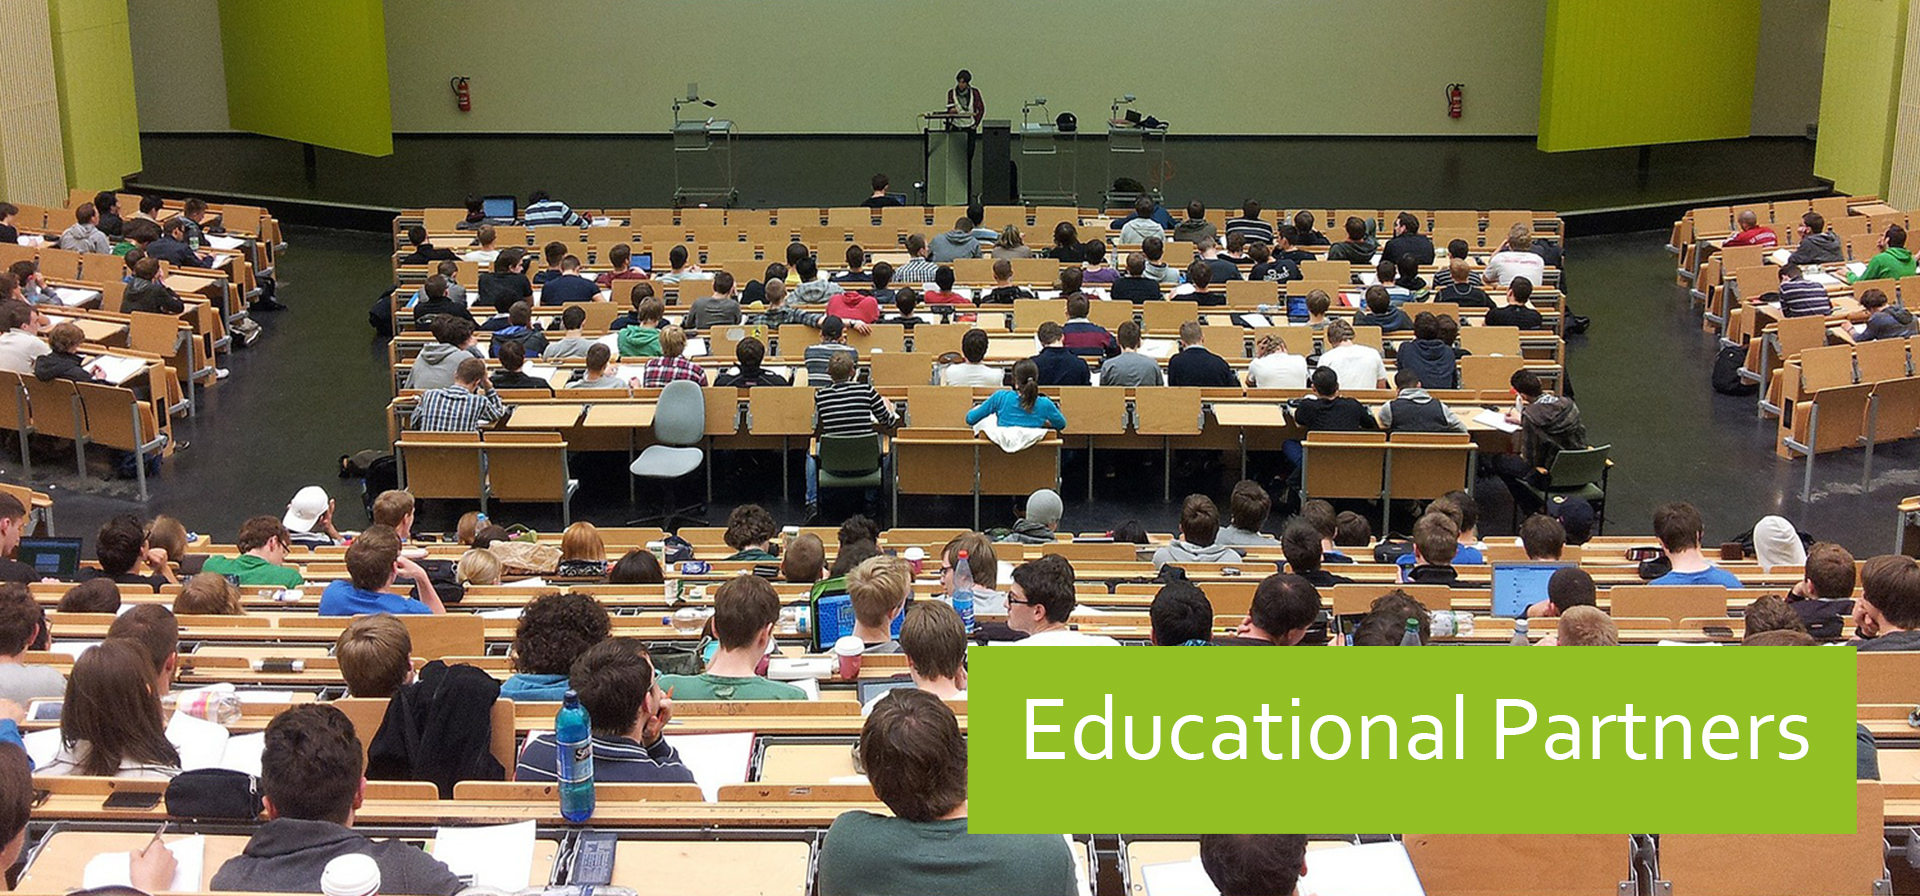 Educational Partners.jpg